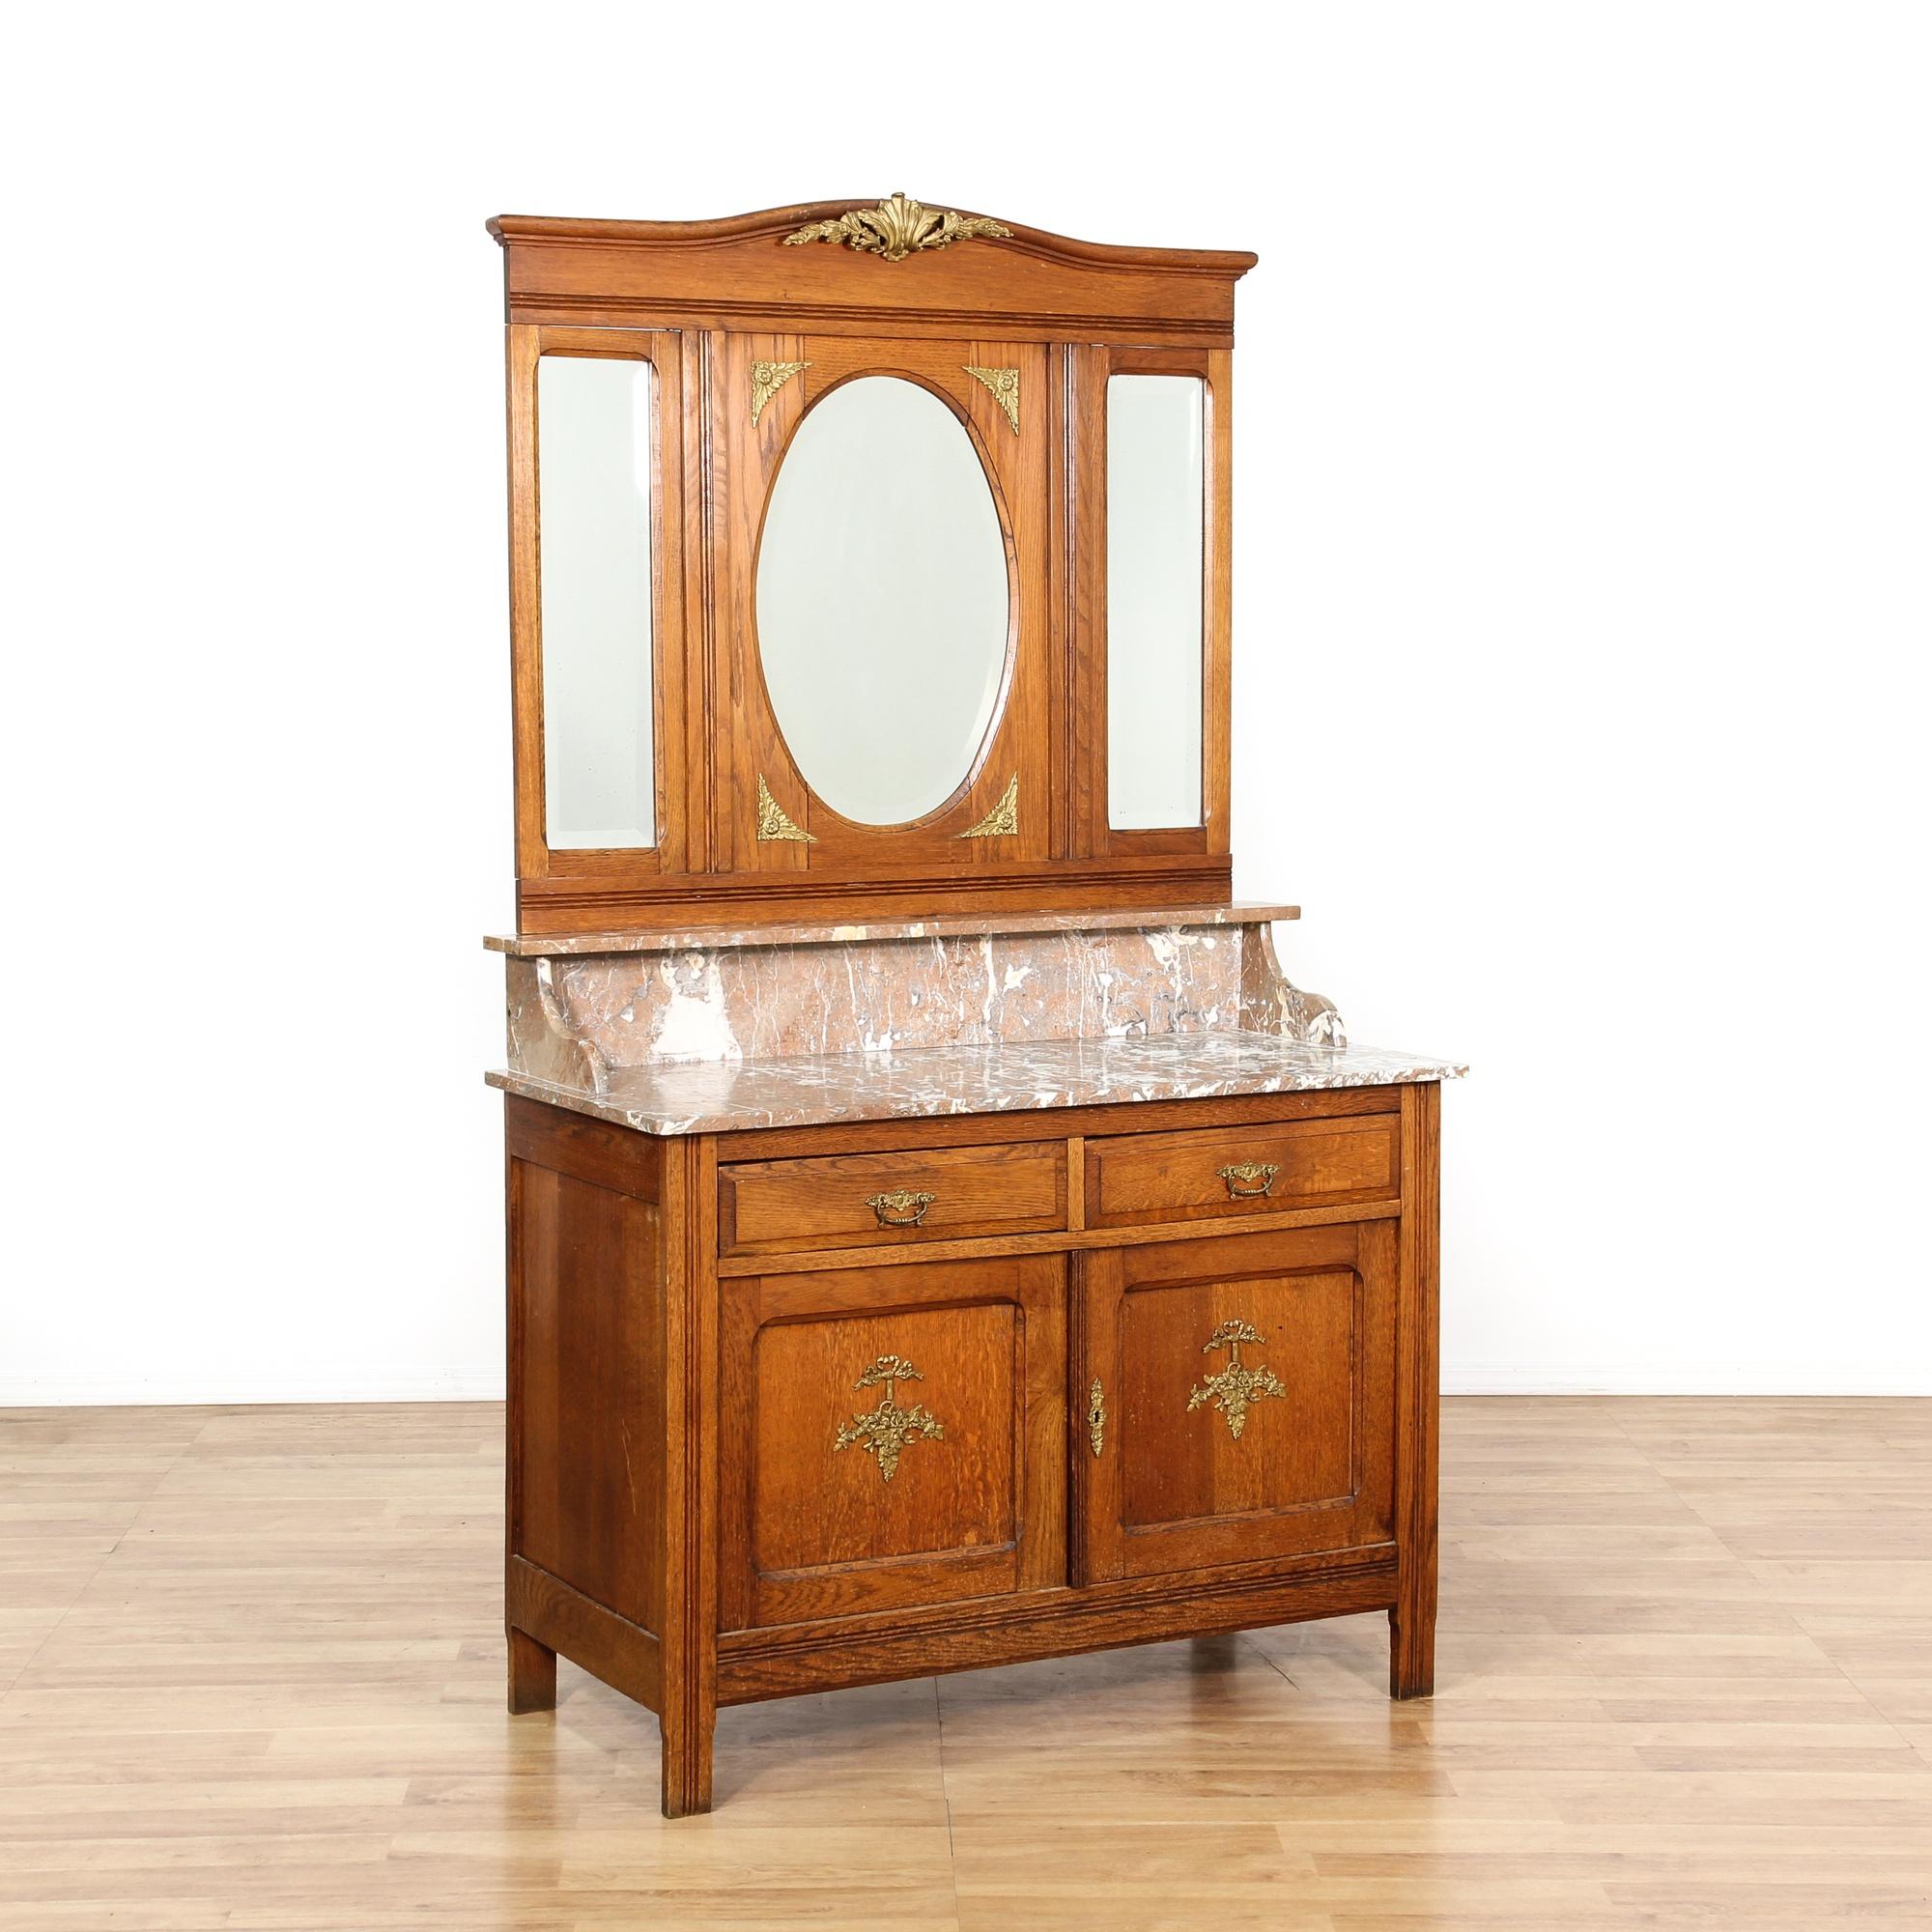 Antique Oak Marble Top Server Buffet w Mirrors